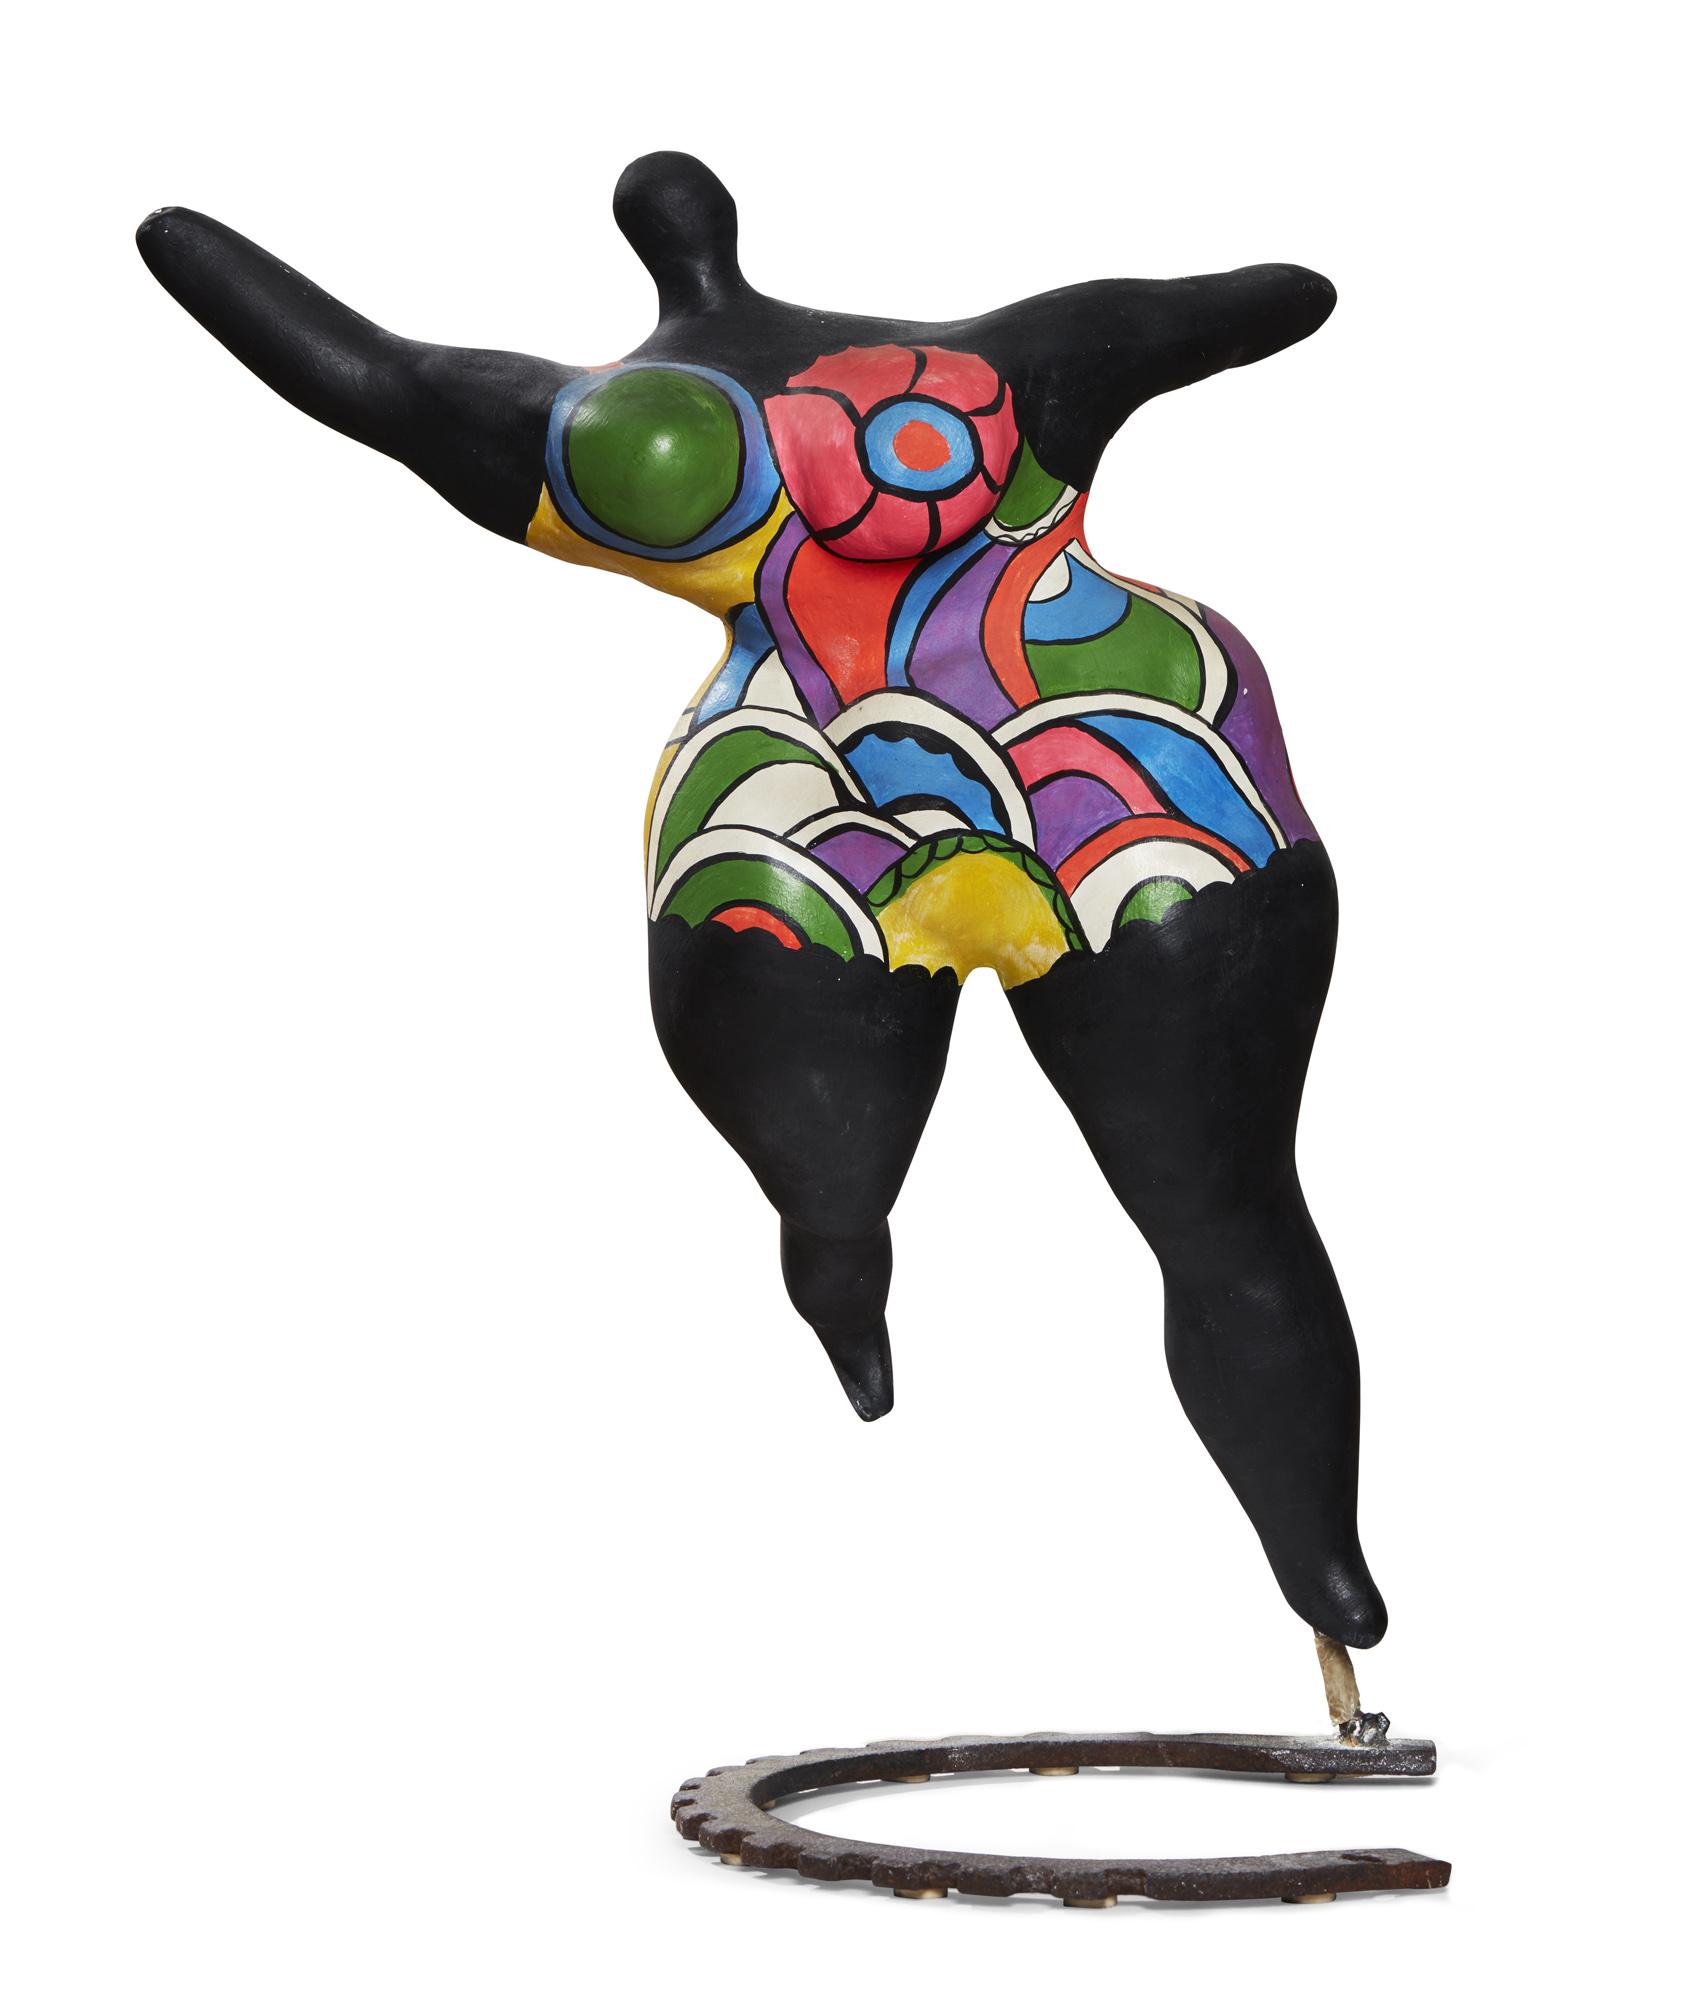 Niki de Saint Phalle    Nana moyenne danseuse  1970 Unique Painted plaster on metal base by Jean Tinguely Height 56 cm